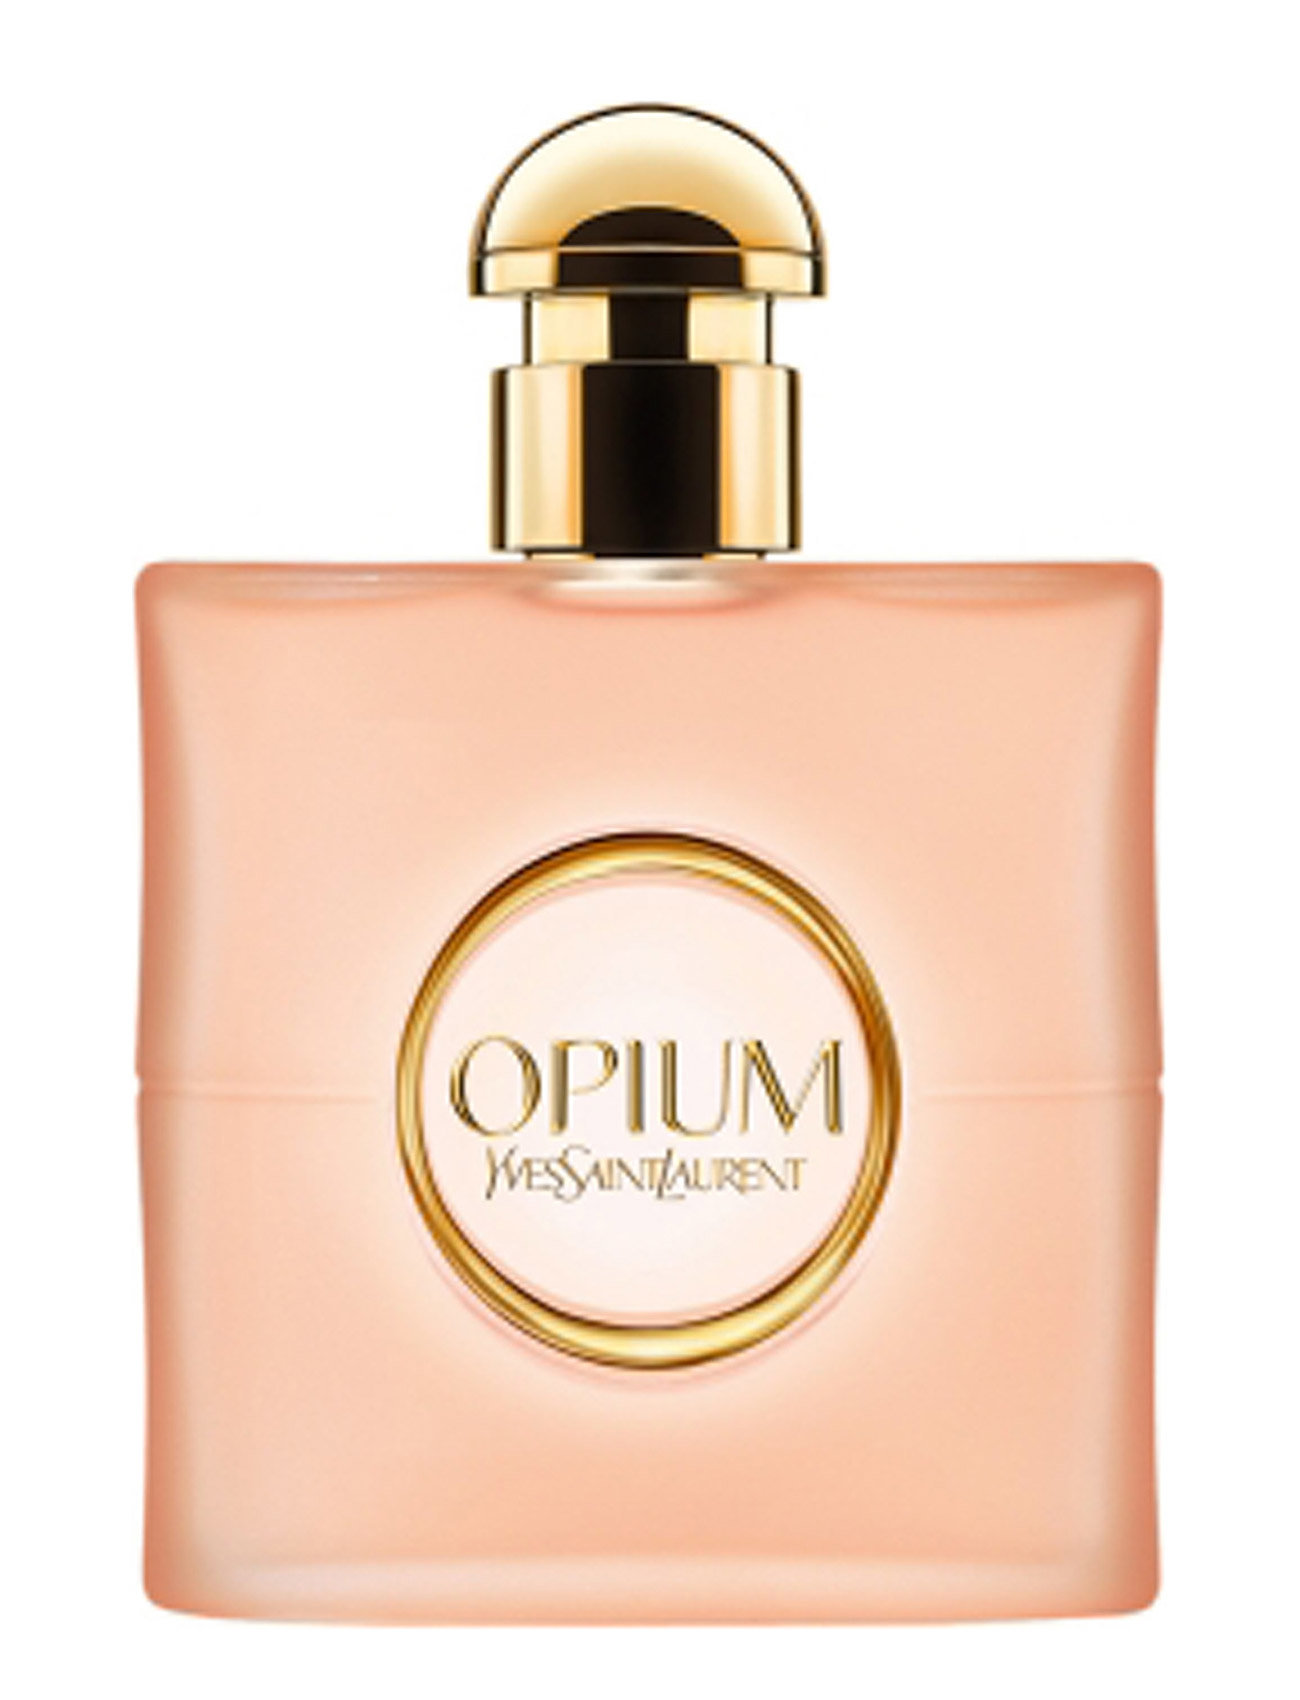 yves saint laurent – Opium vapeurs de parfum 50 ml. fra boozt.com dk